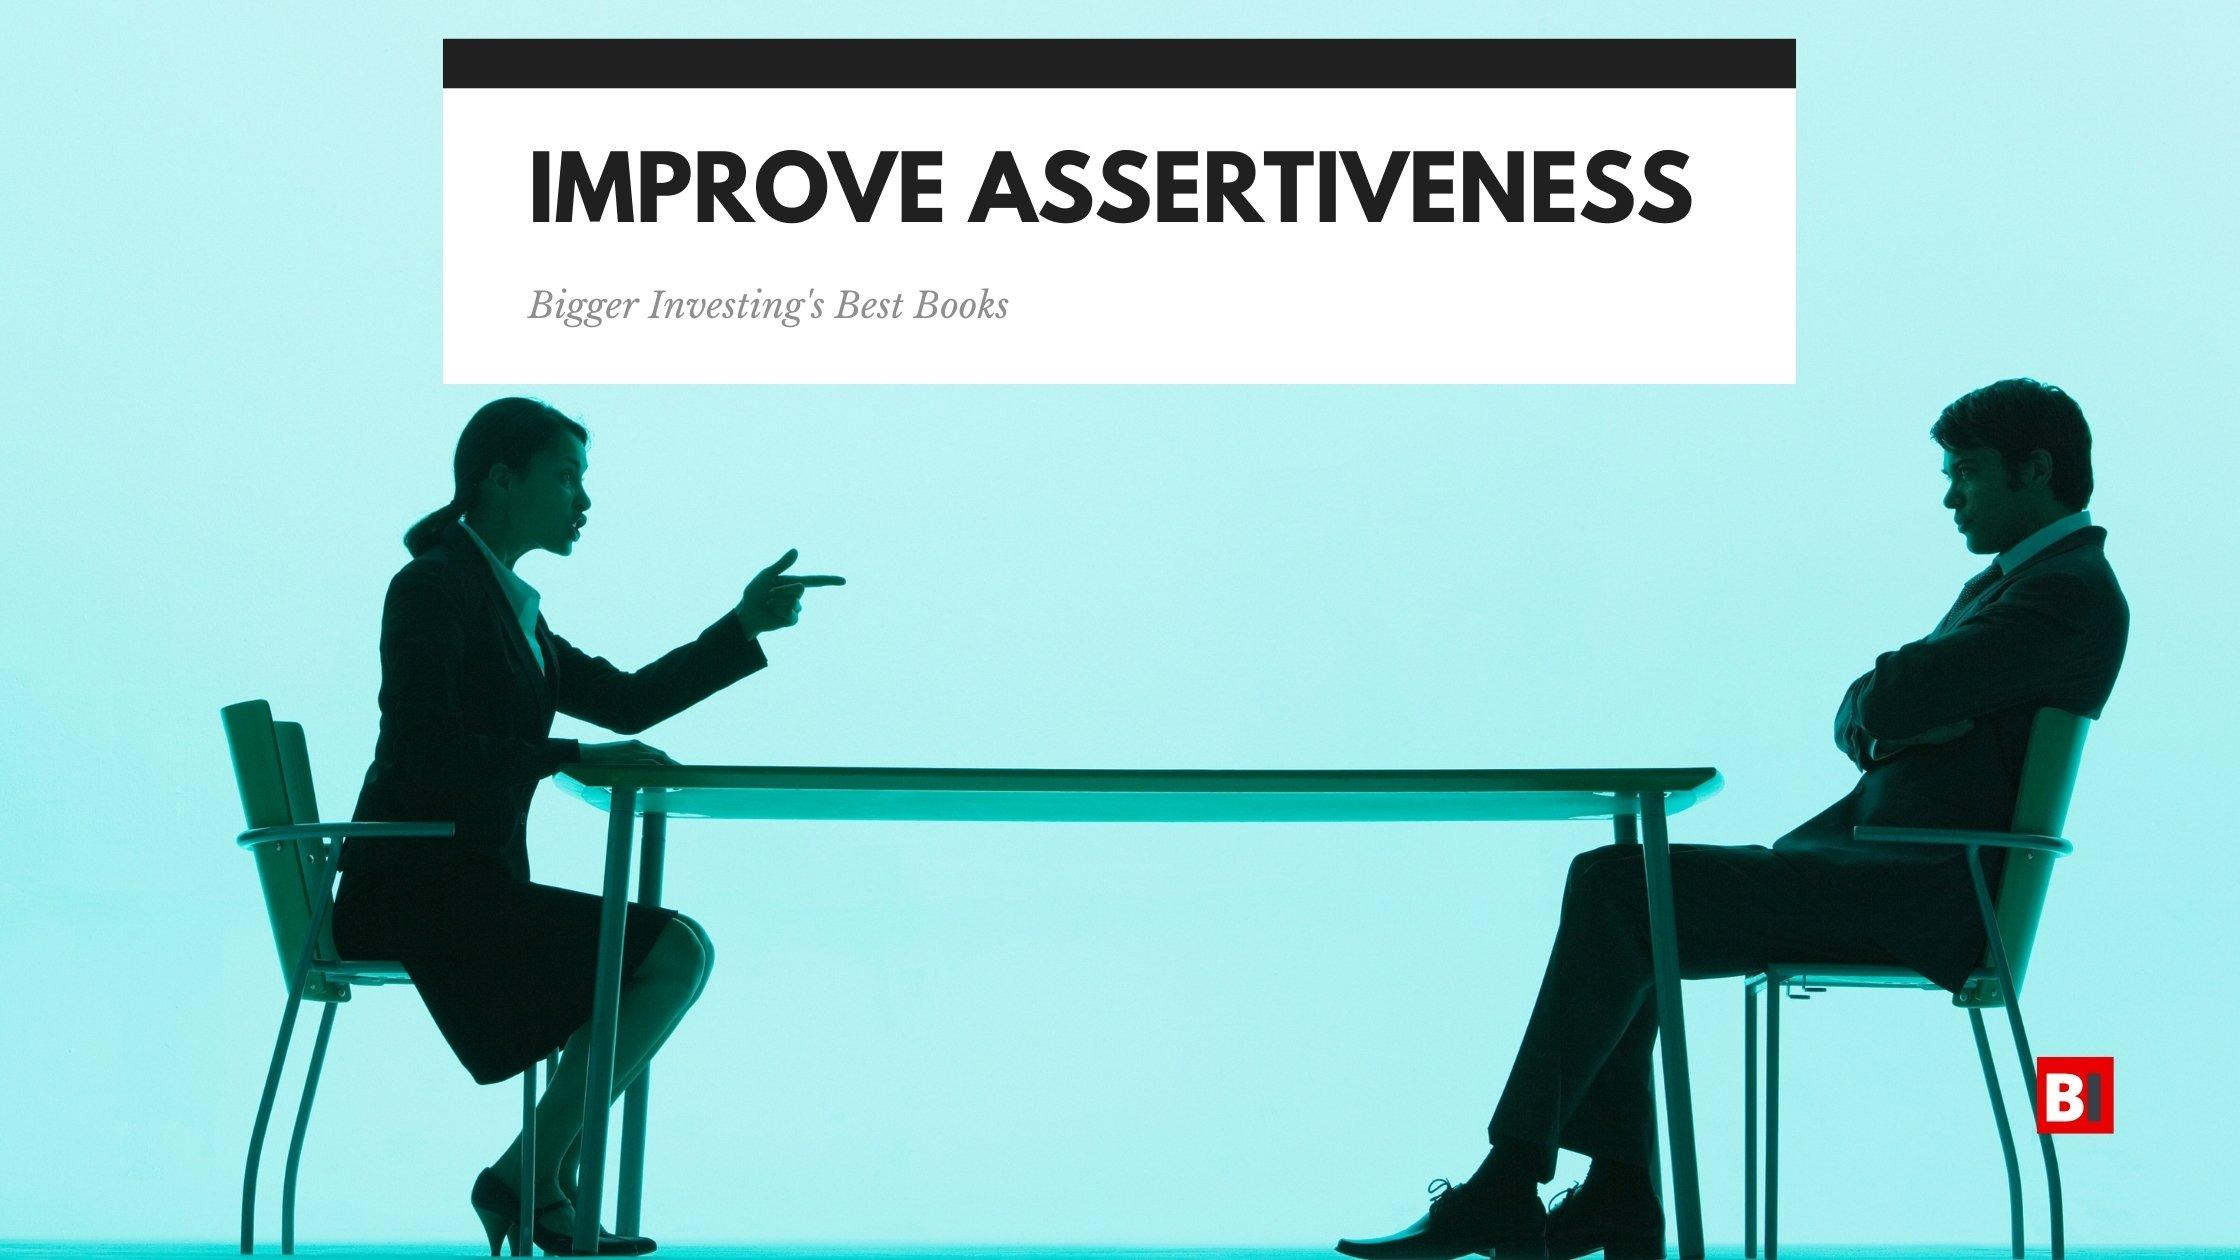 Best Books to Improve Assertiveness